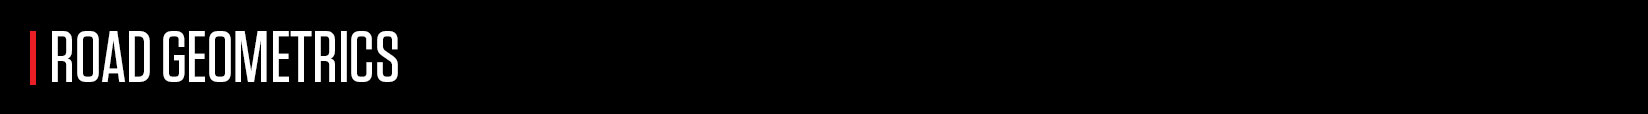 Geometricssubheader.jpg